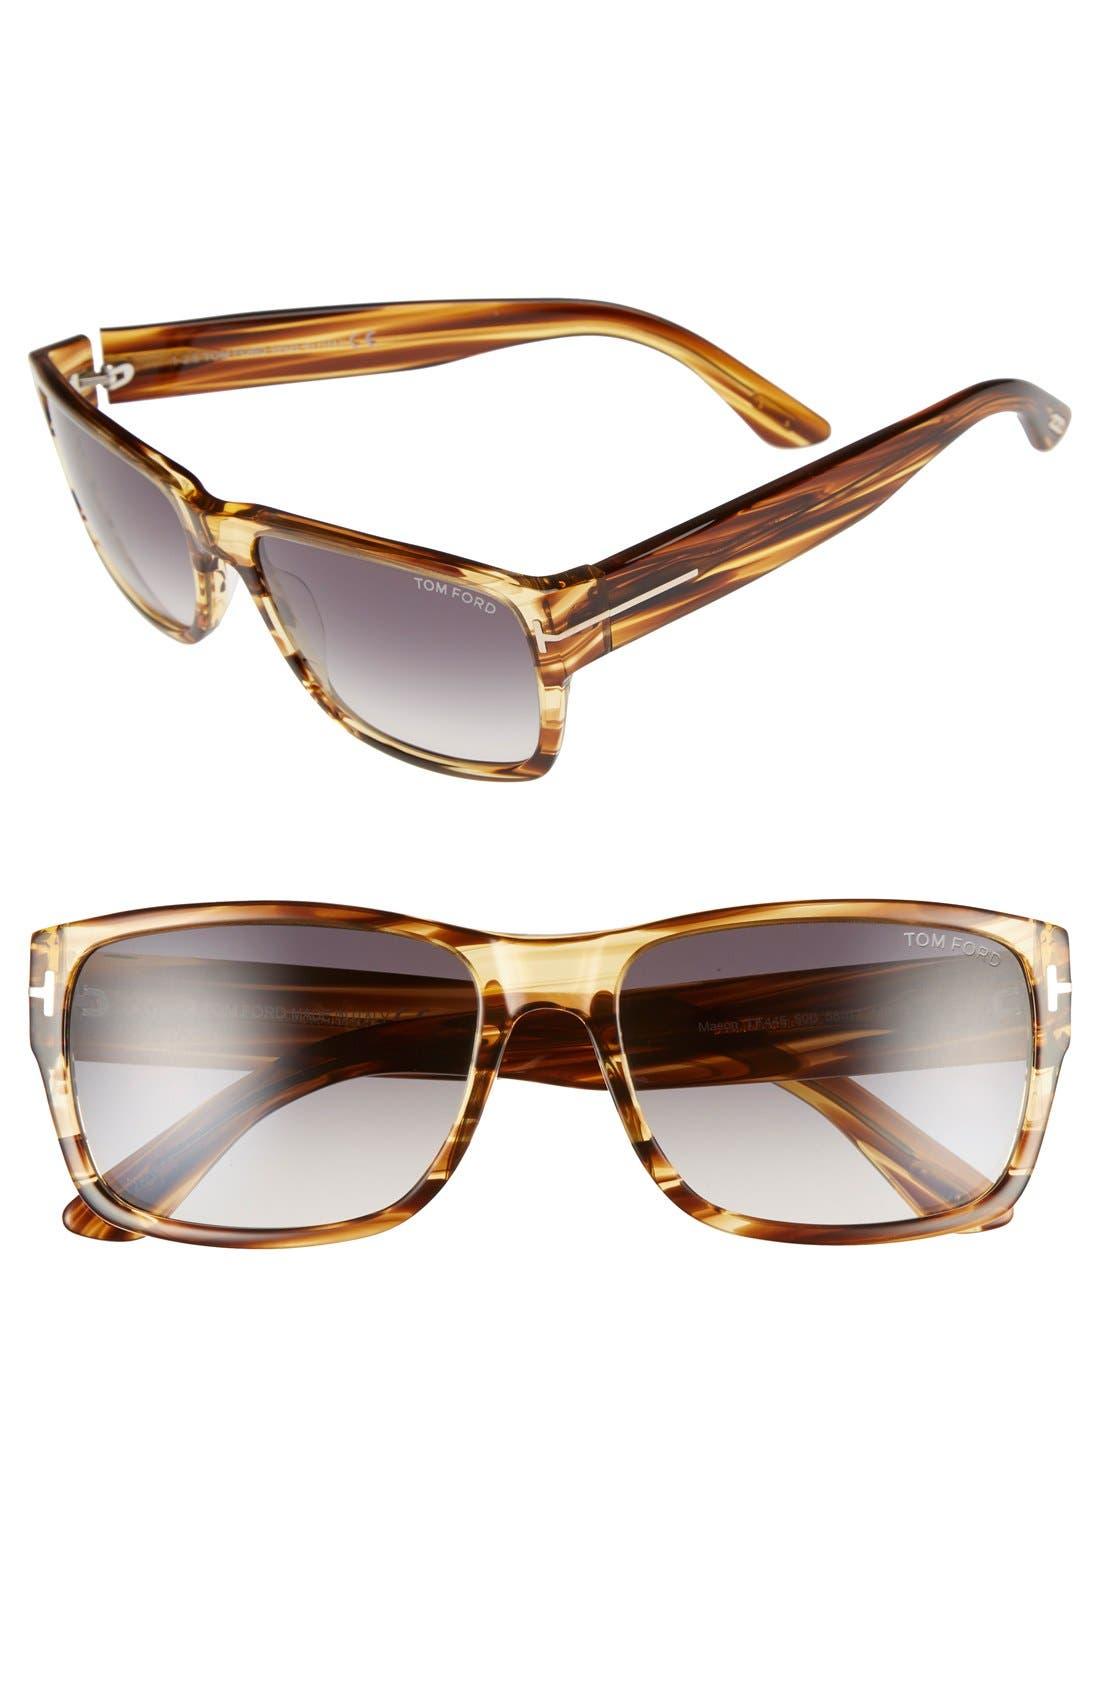 Tom Ford 'Mason' 58mm Sunglasses